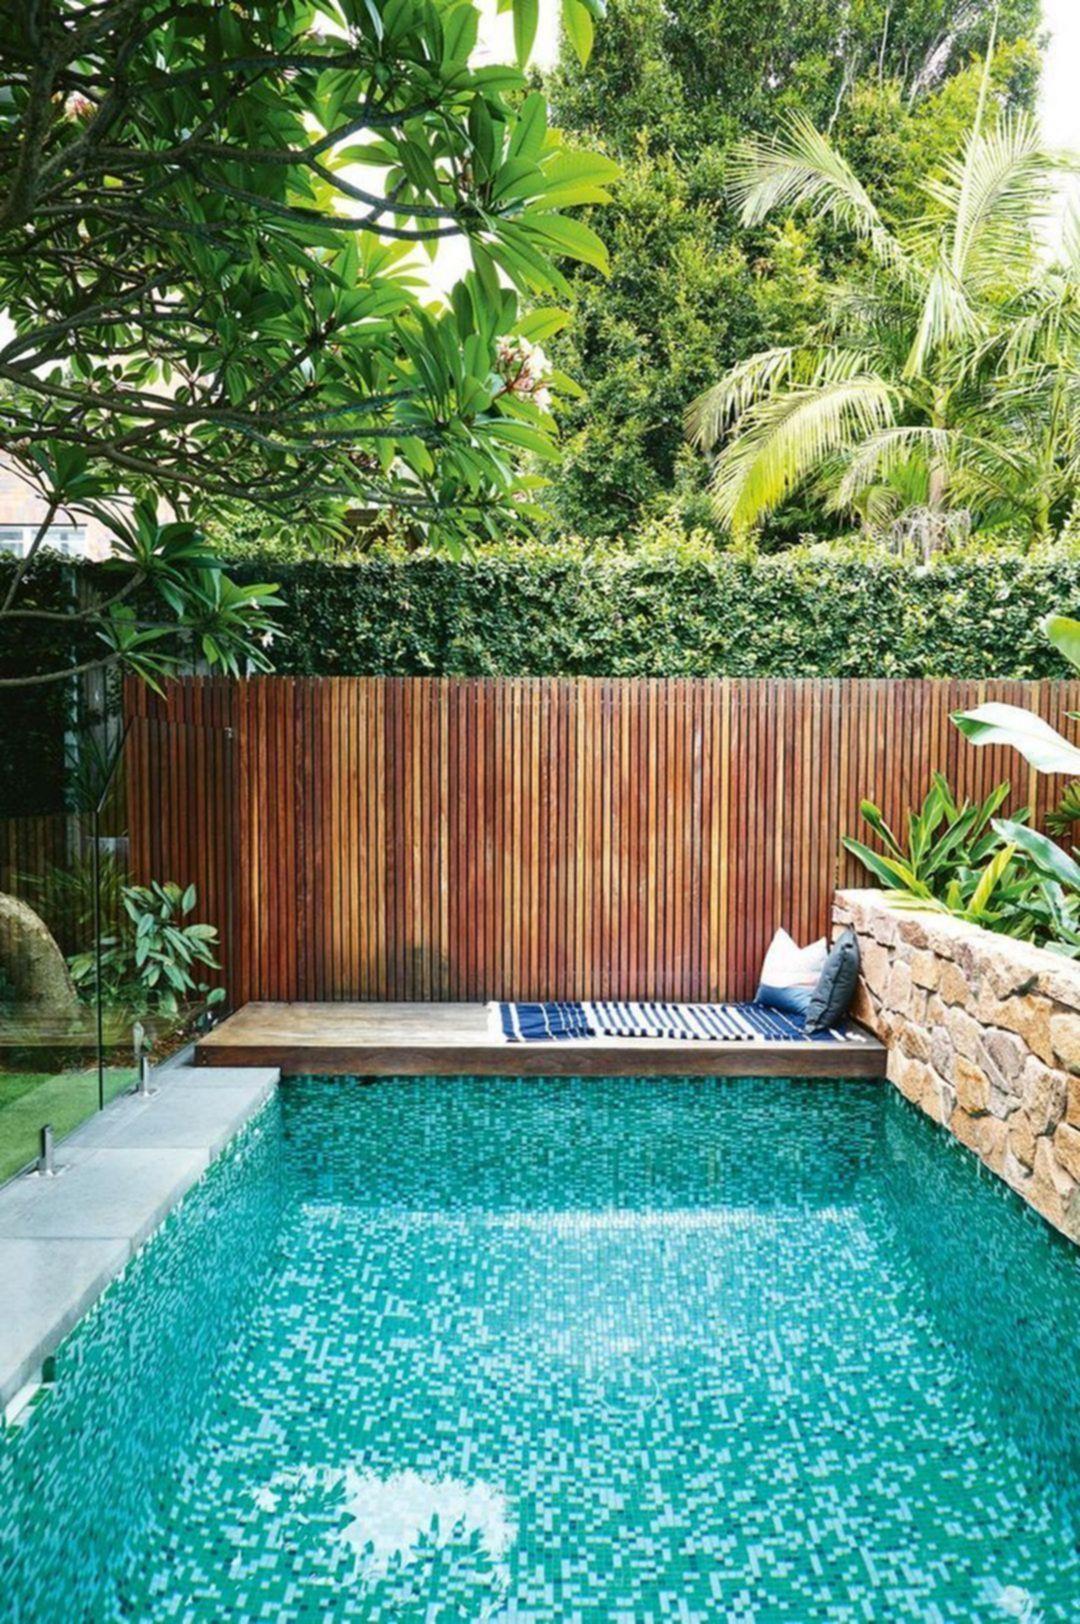 45 Amazing Backyard Garden With Swimming Pool Ideas Swimming Pools Backyard Backyard Pool Swimming Pool Designs